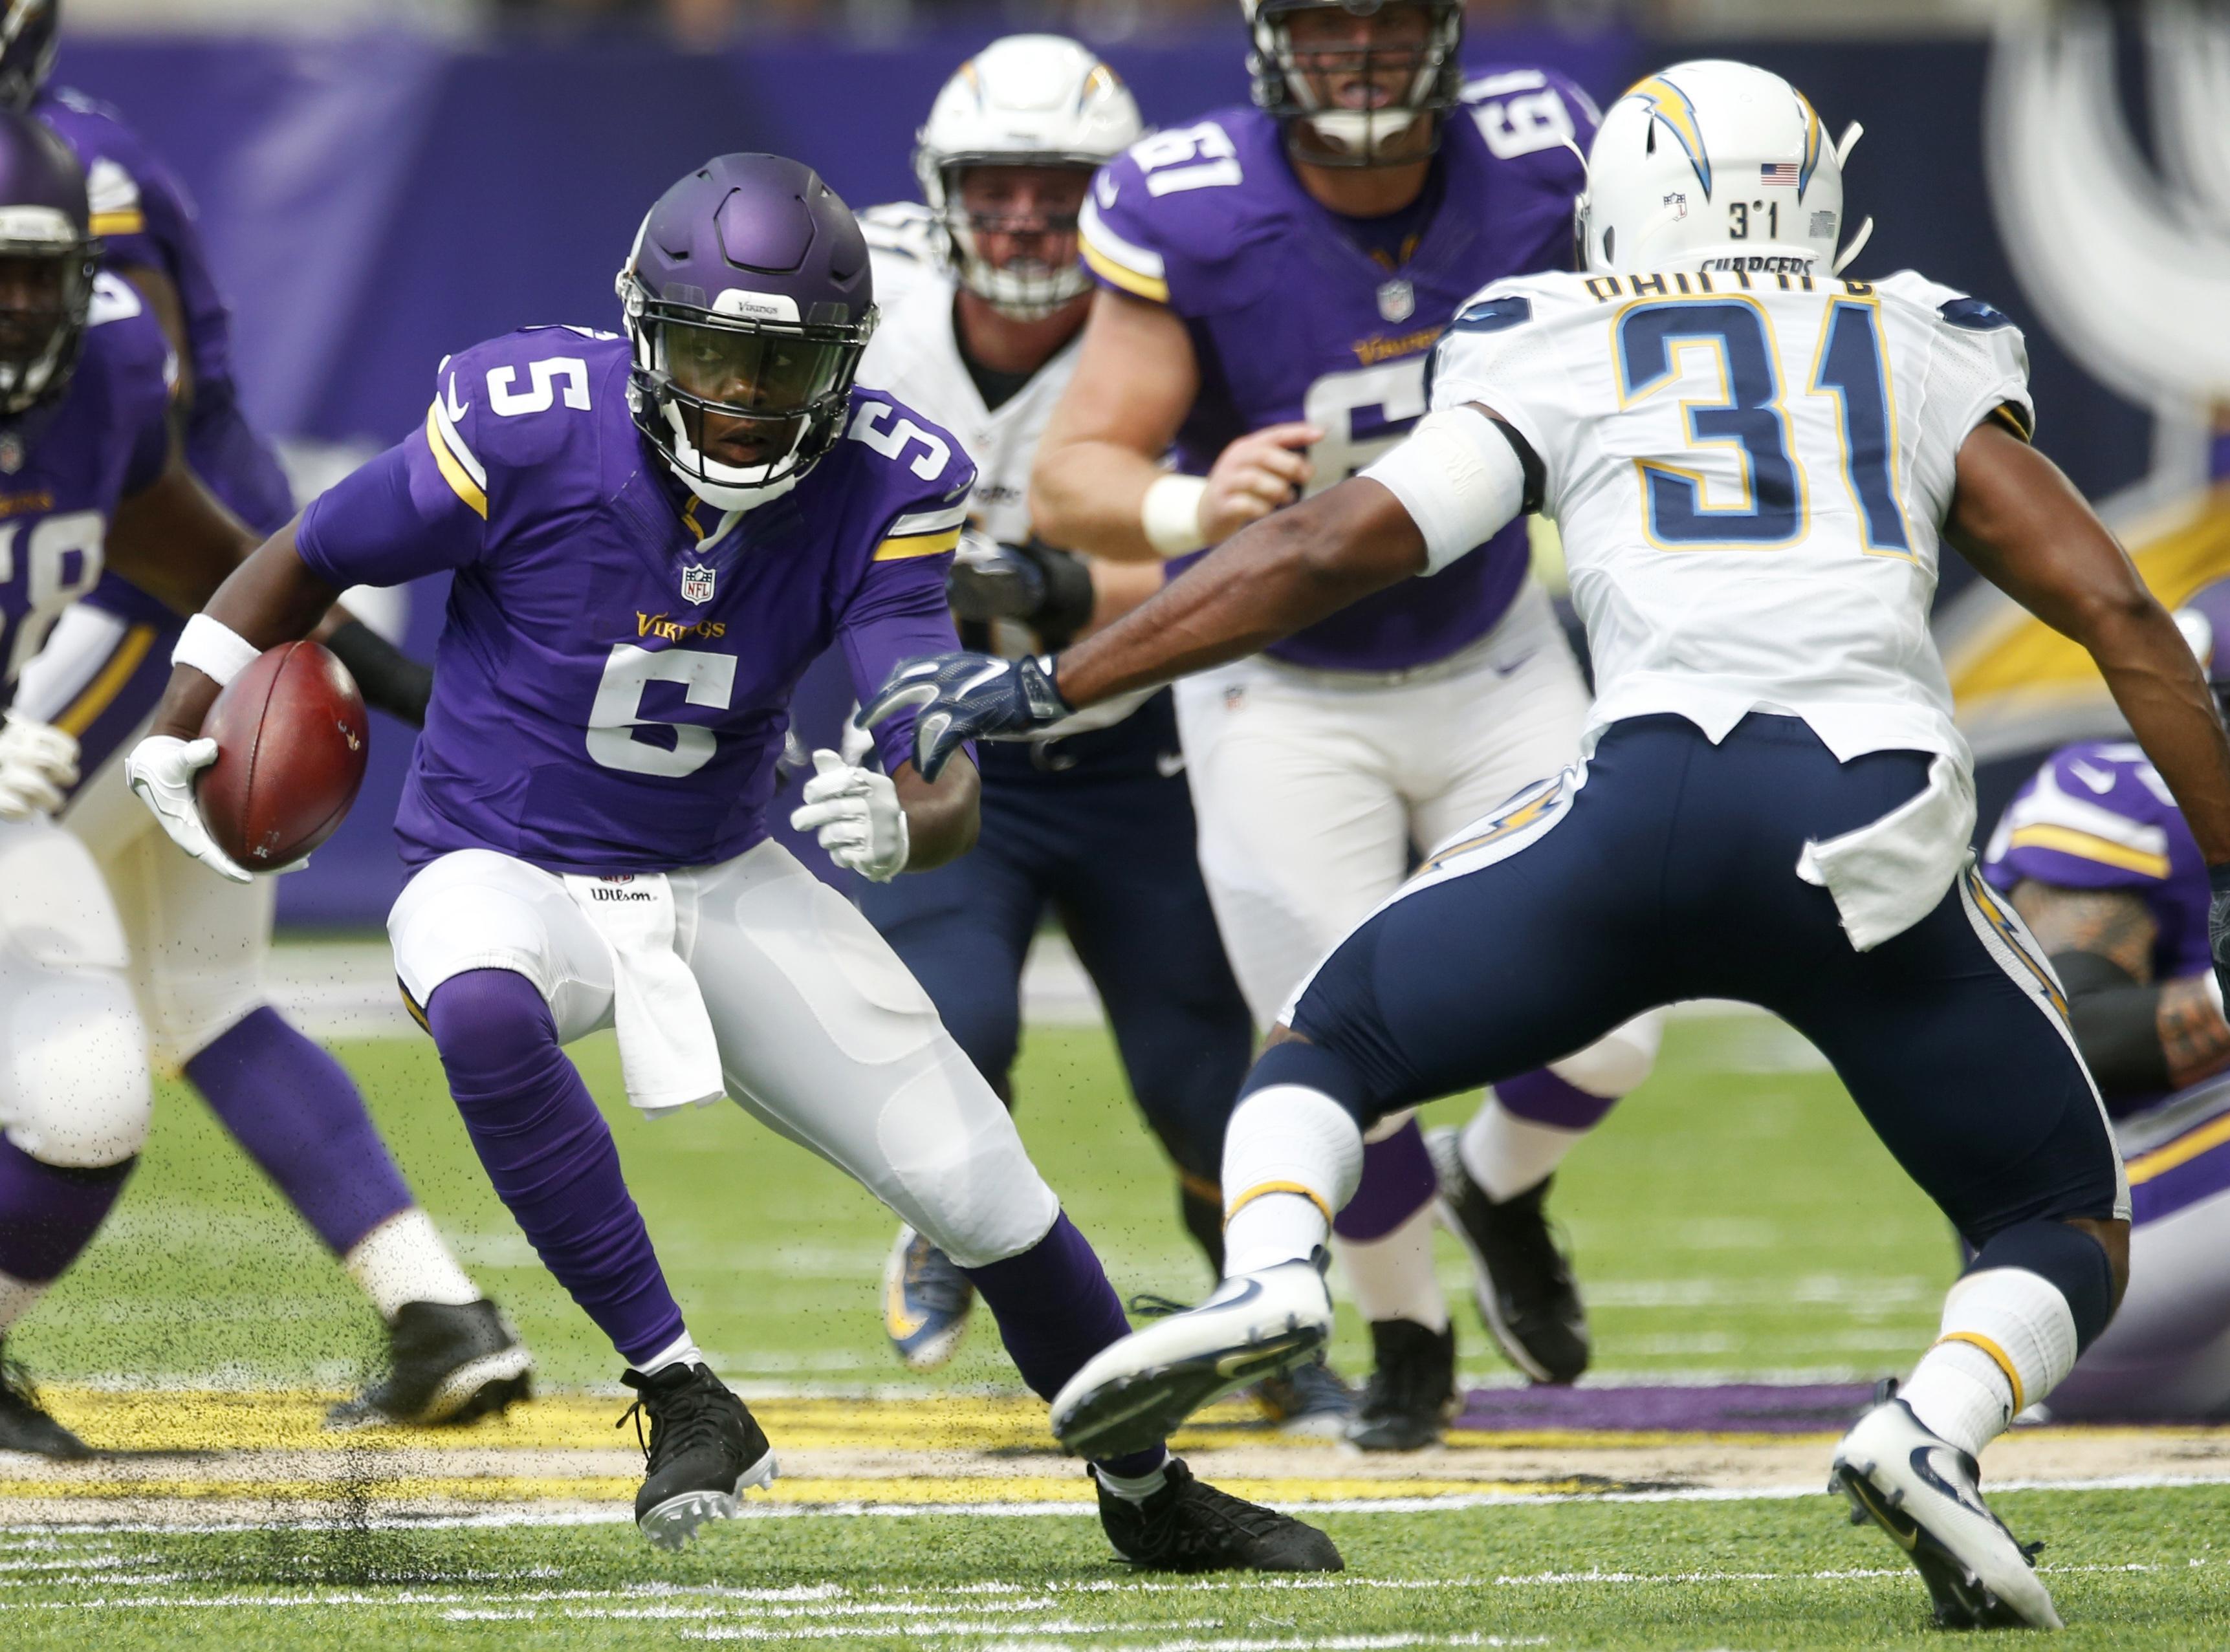 Minnesota Vikings Quarterback Teddy Bridgewater 5